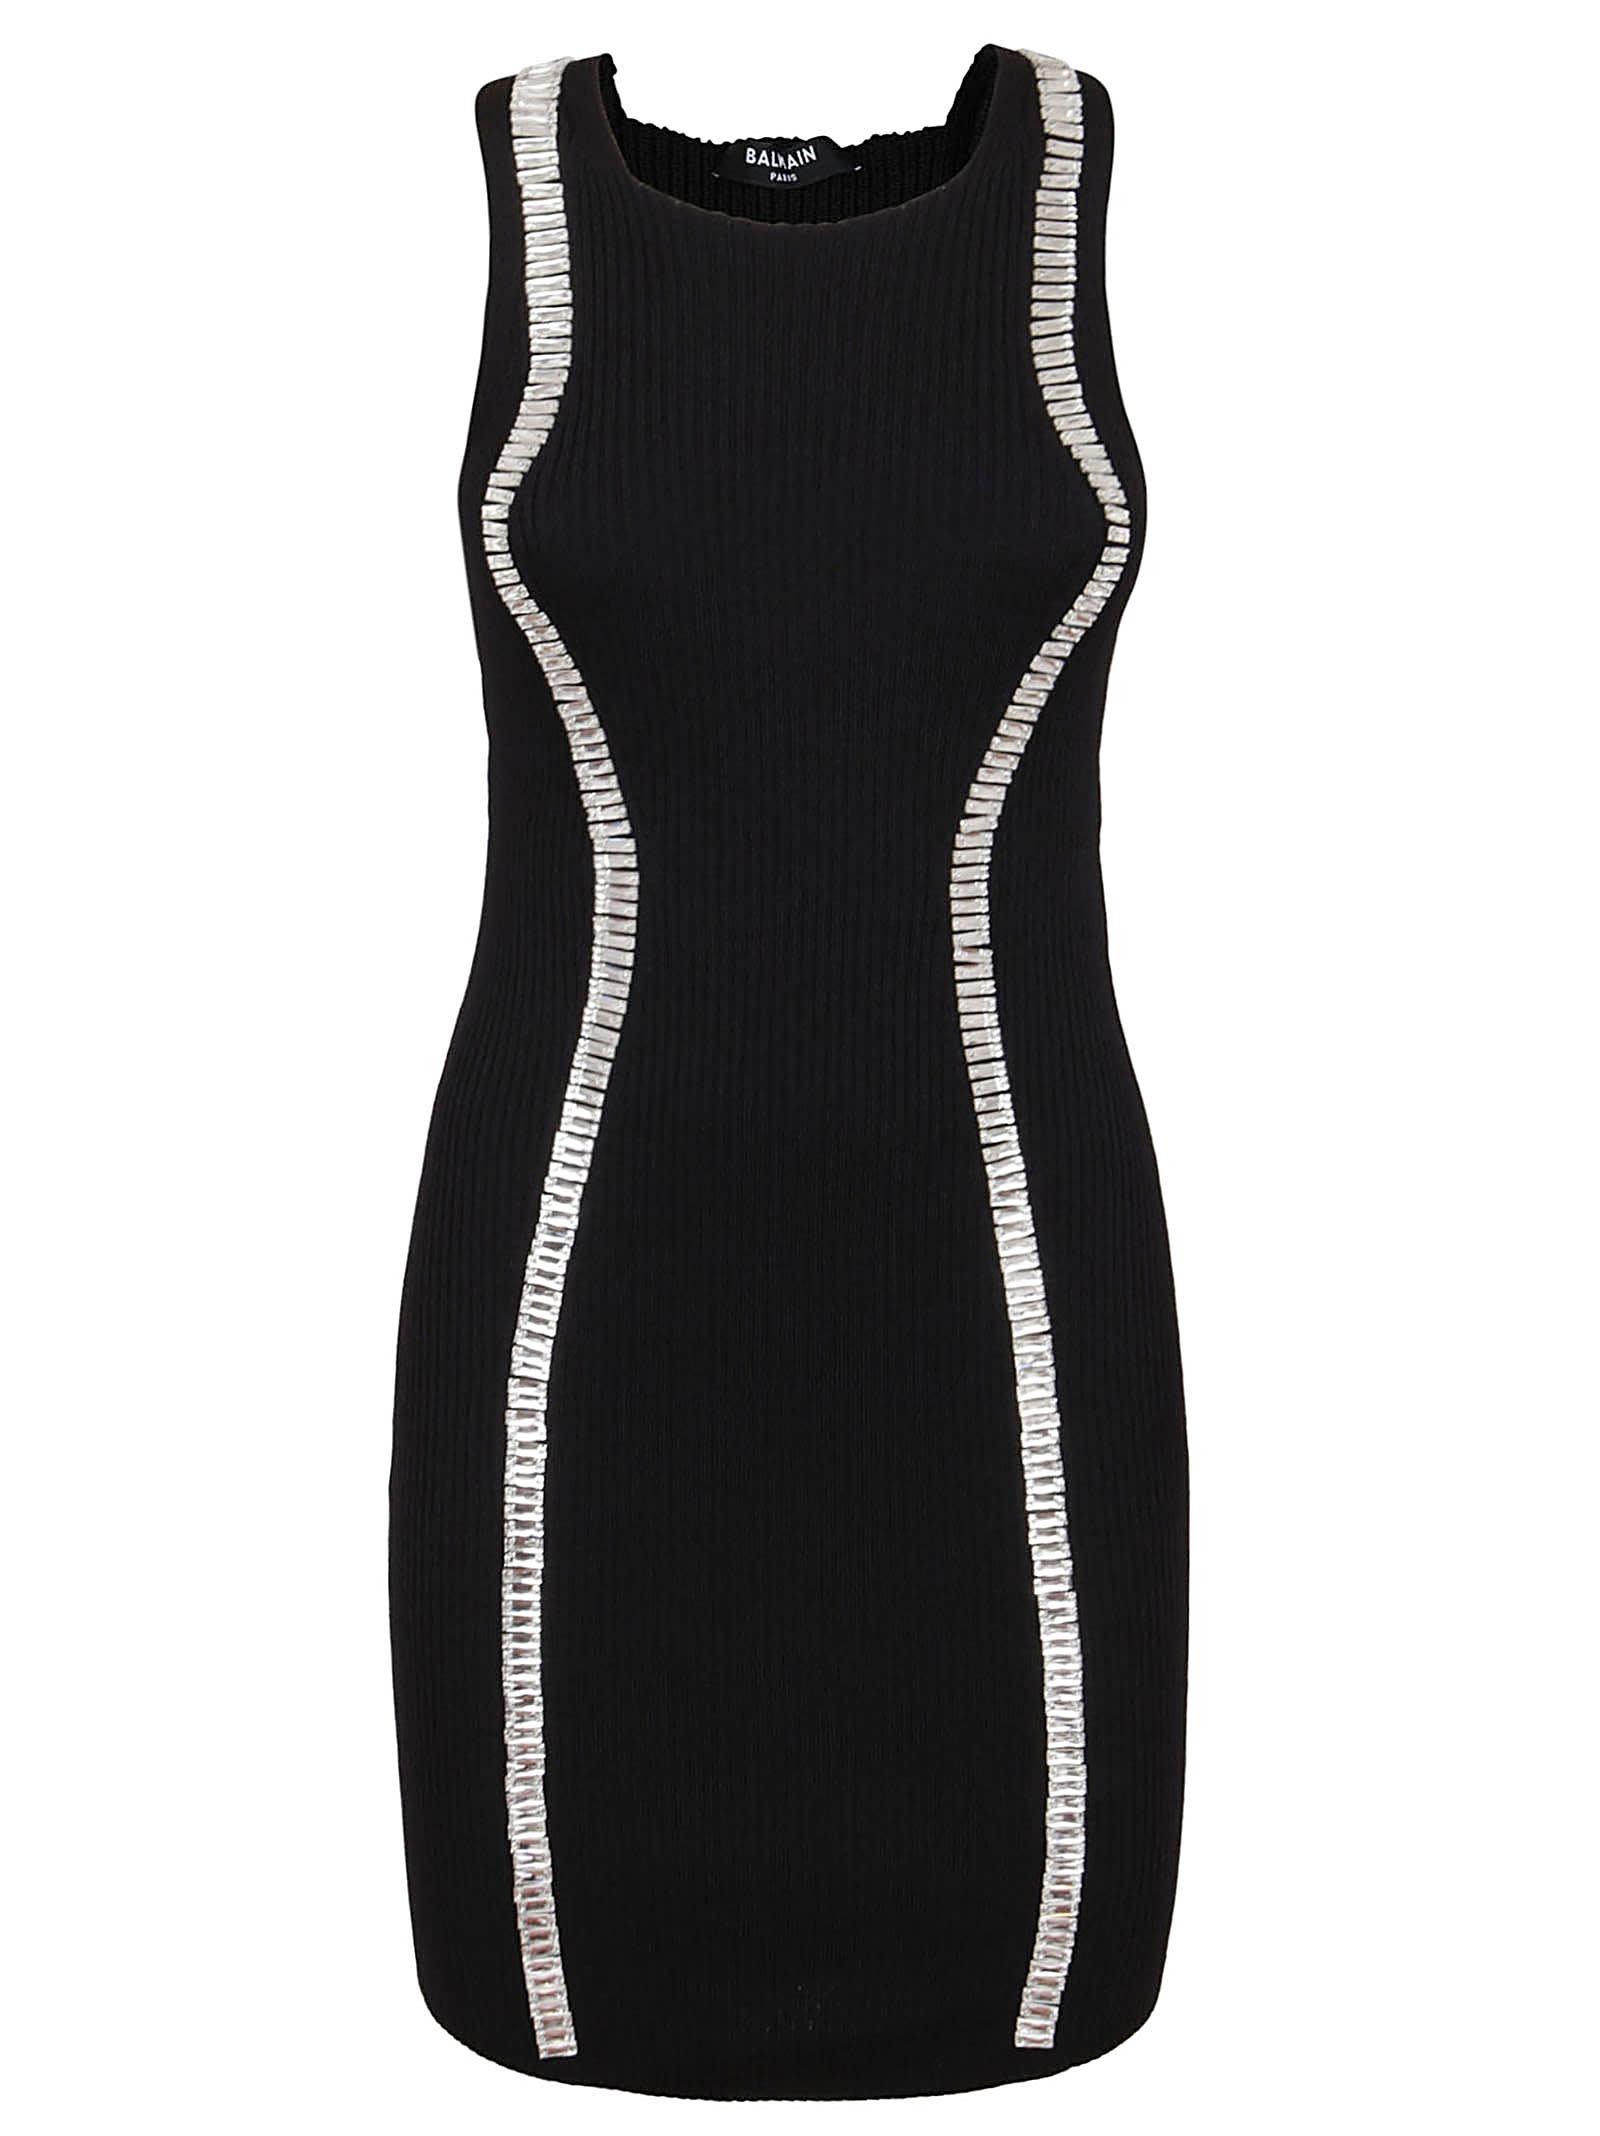 Buy Balmain Short Sleeveless Embroidered Knit Dress online, shop Balmain with free shipping